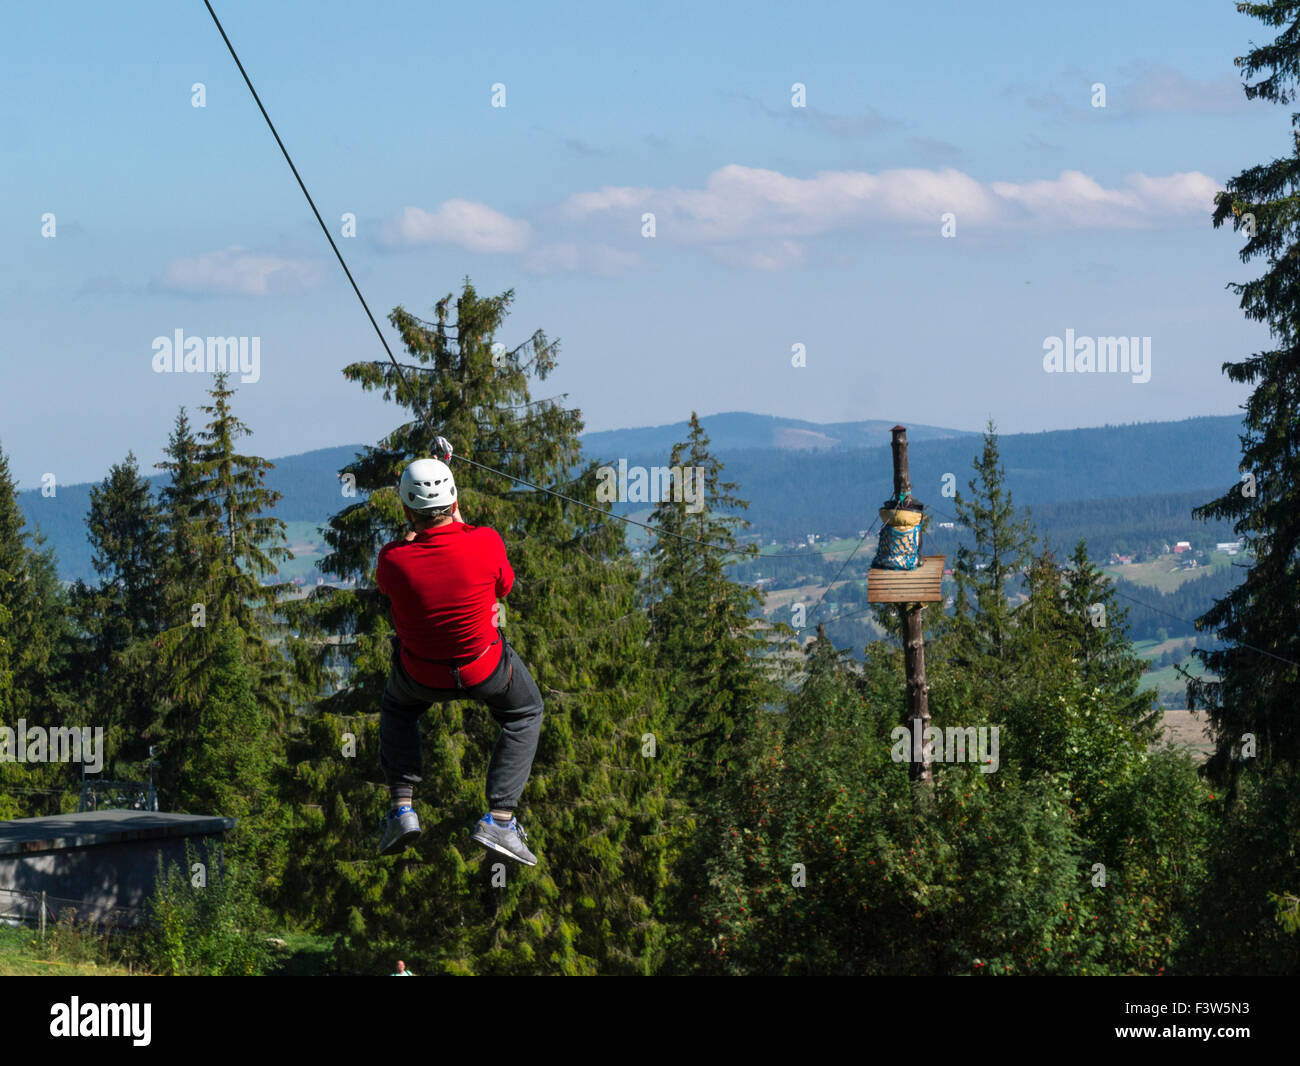 Young man on zipwire of Trollandia Highwire park Gubalowka Hill Zakopane Poland excitement adrenalin rush on lovely - Stock Image